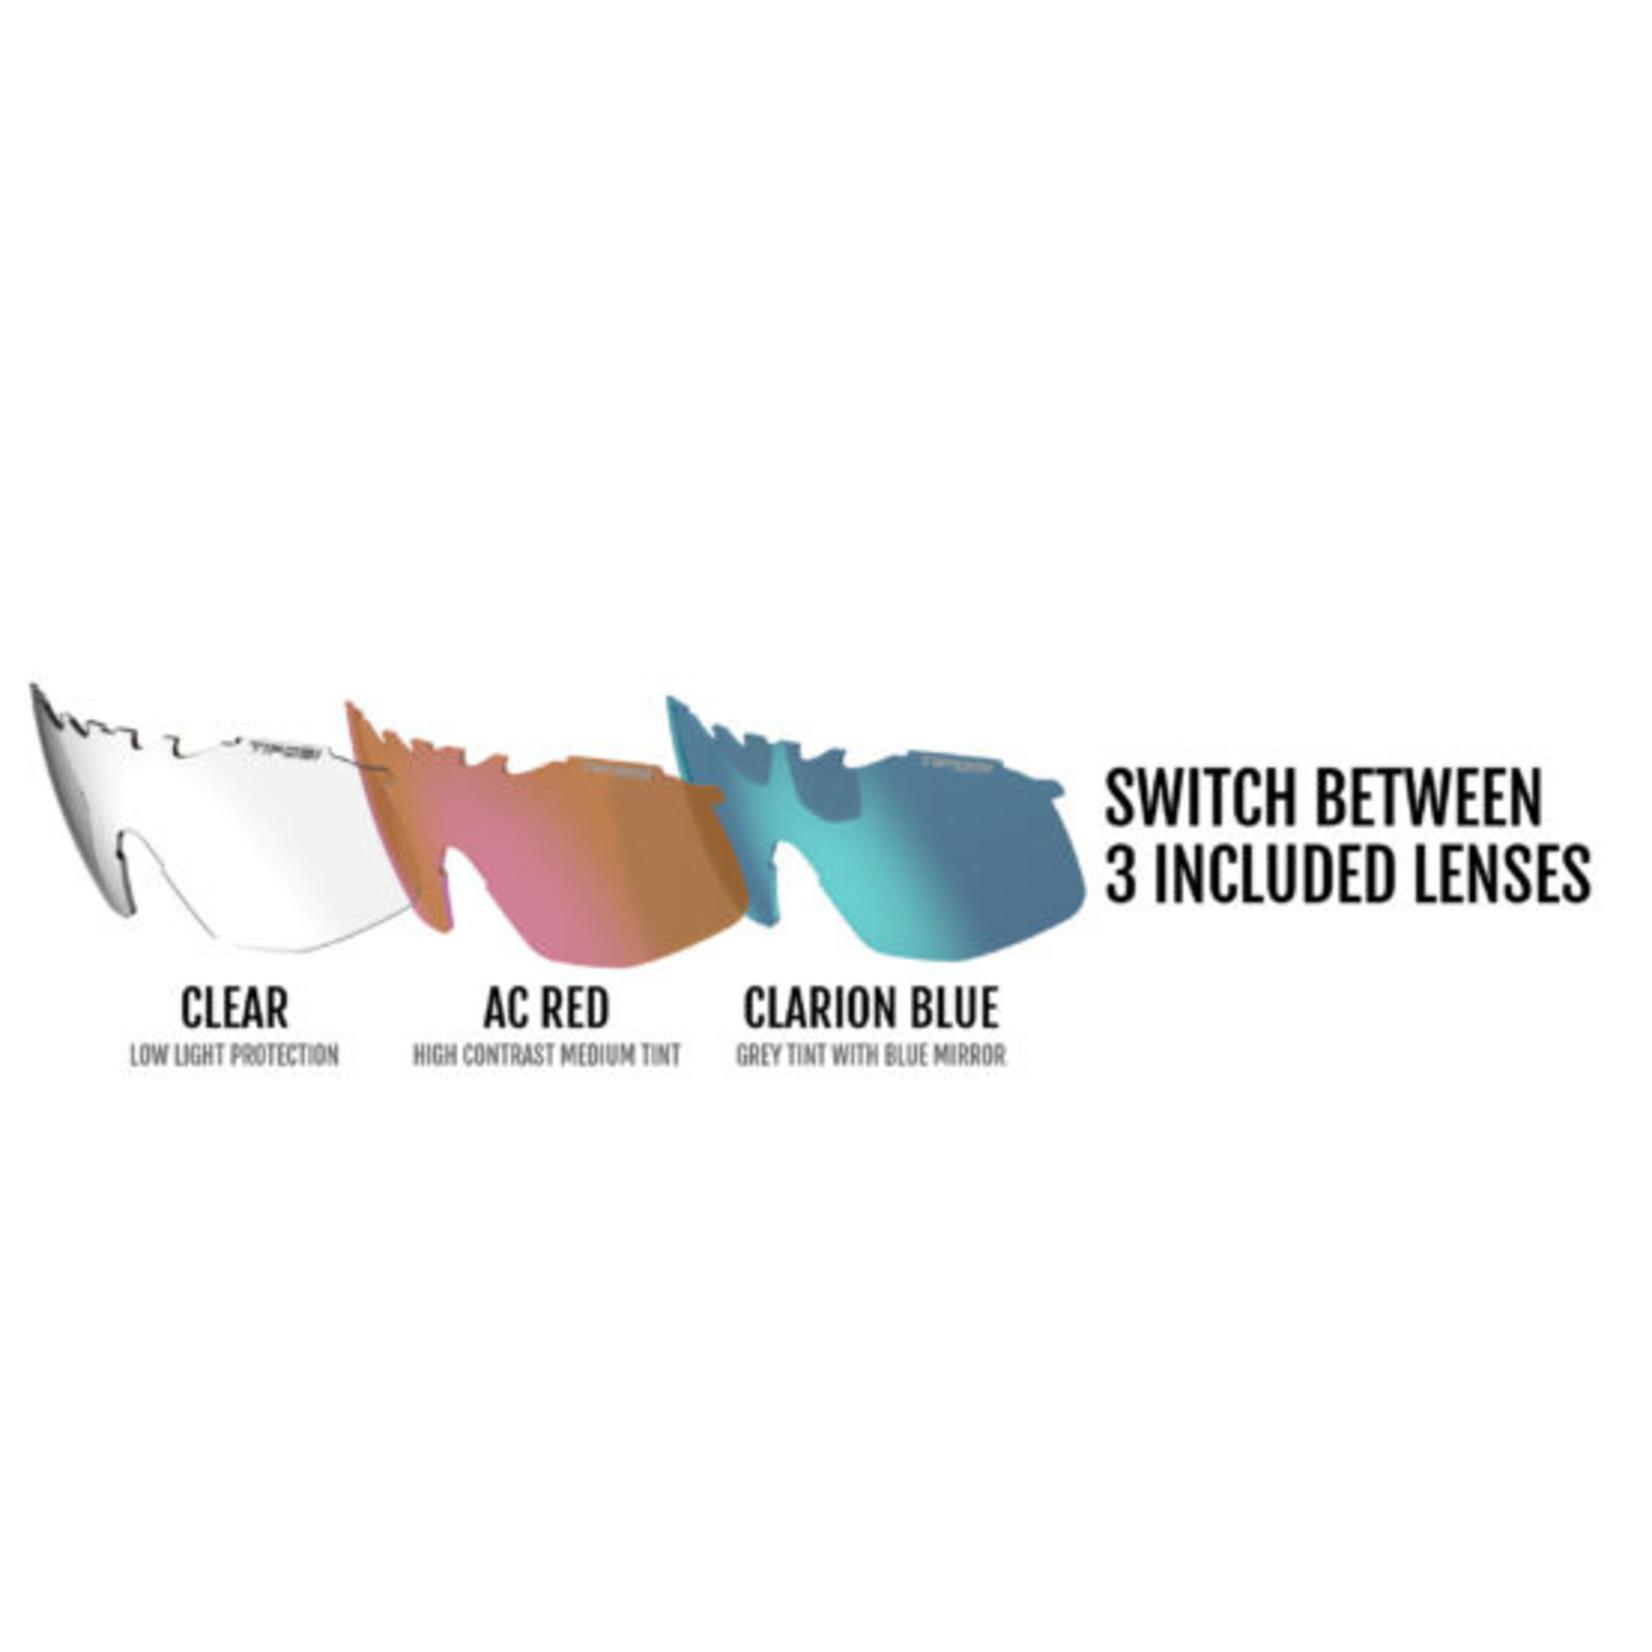 Tifosi Optics Tifosi Sledge, Crystal Orange Interchangeable Sunglasses - Clarion Blue/AC Red/Clear